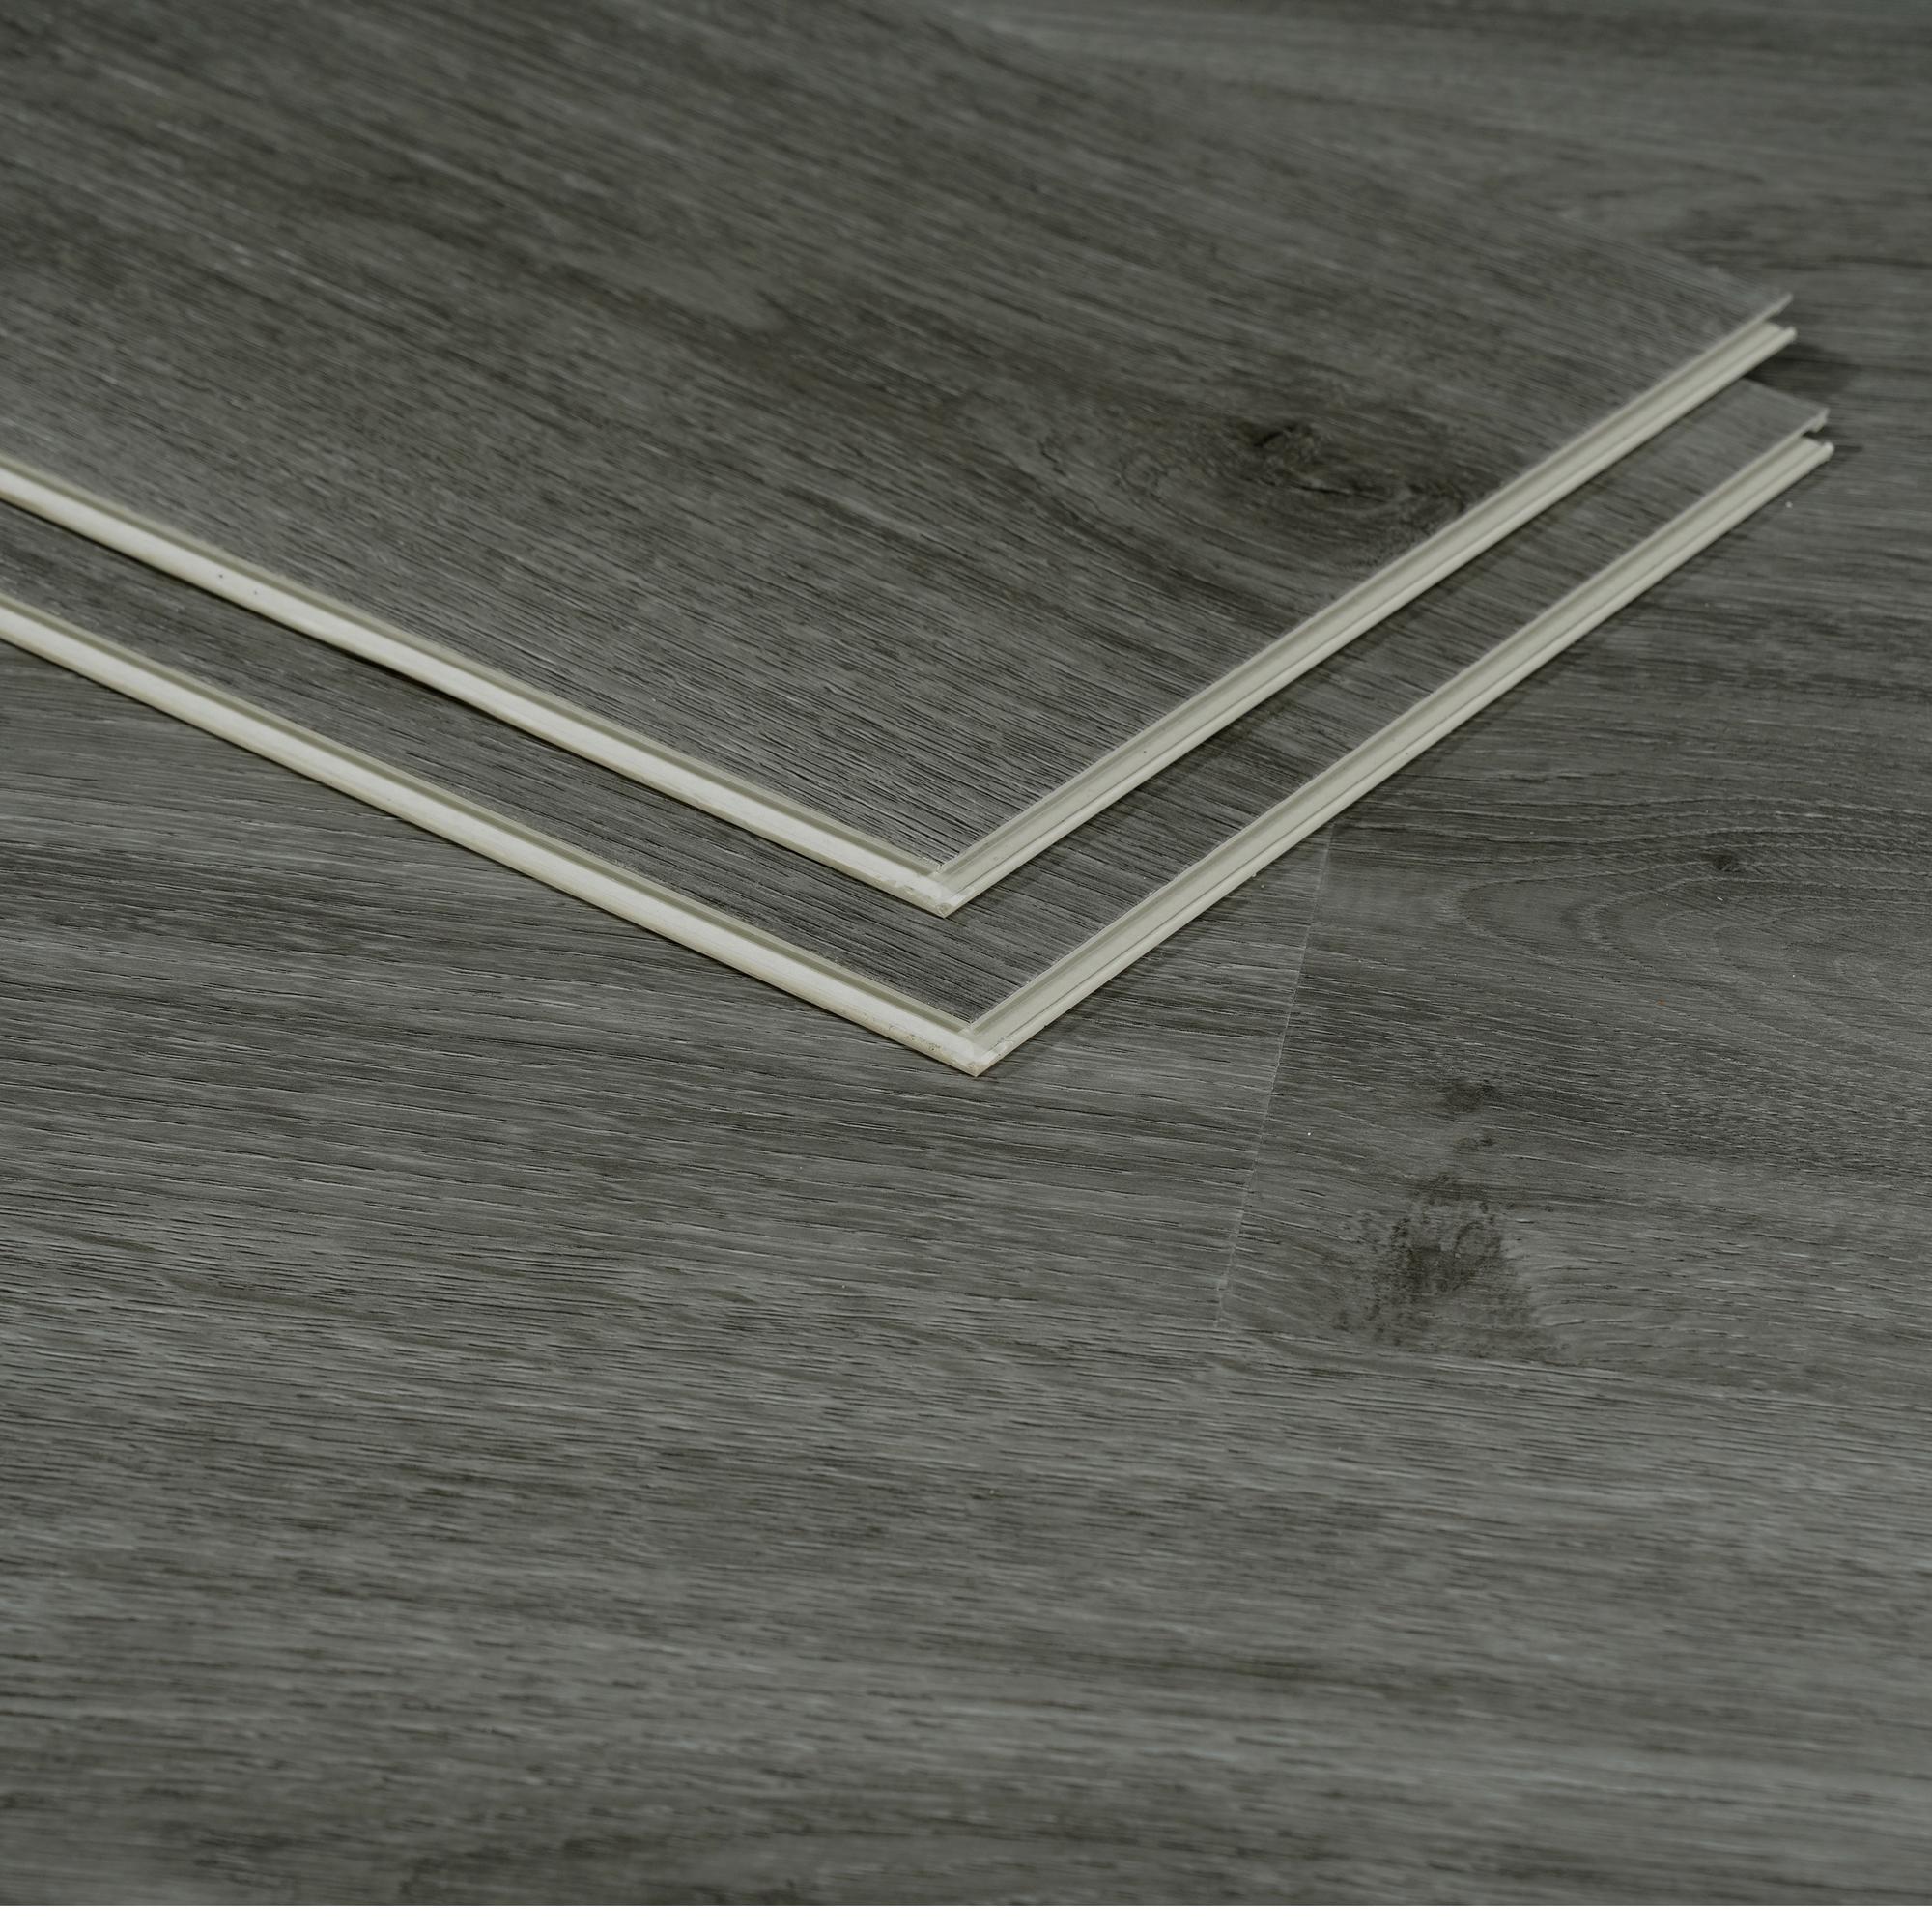 5mm SPC Click Plastic Vinyl Flooring Sheet Waterproof Vinyl Plank